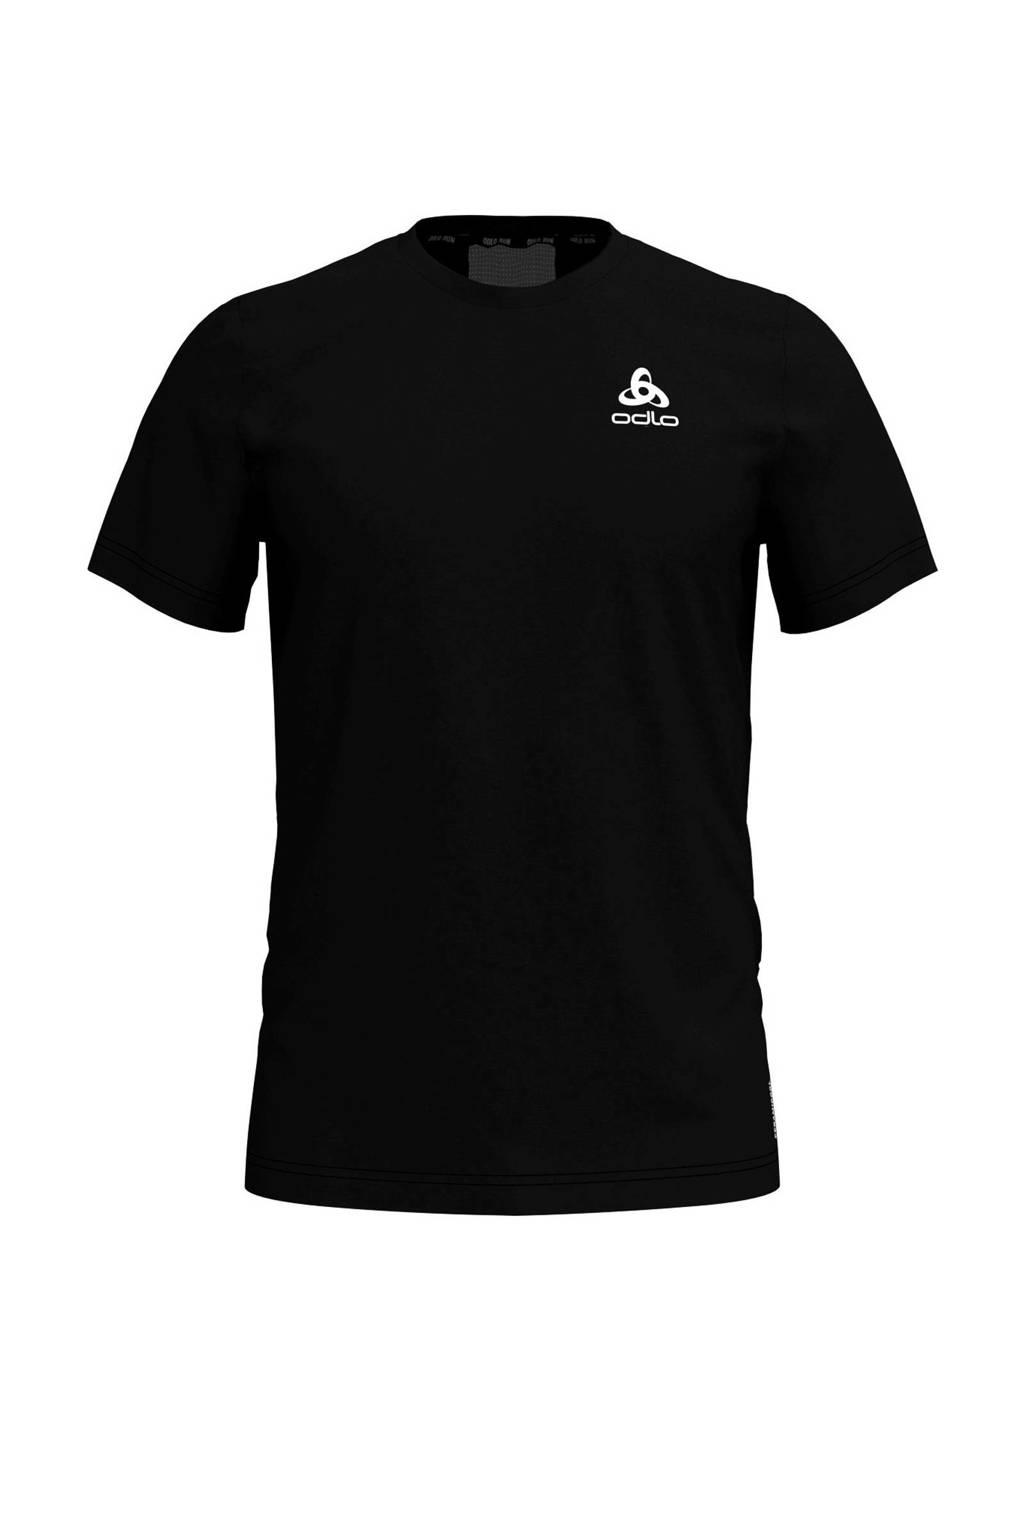 Odlo   hardloop T-shirt blauw, Zwart